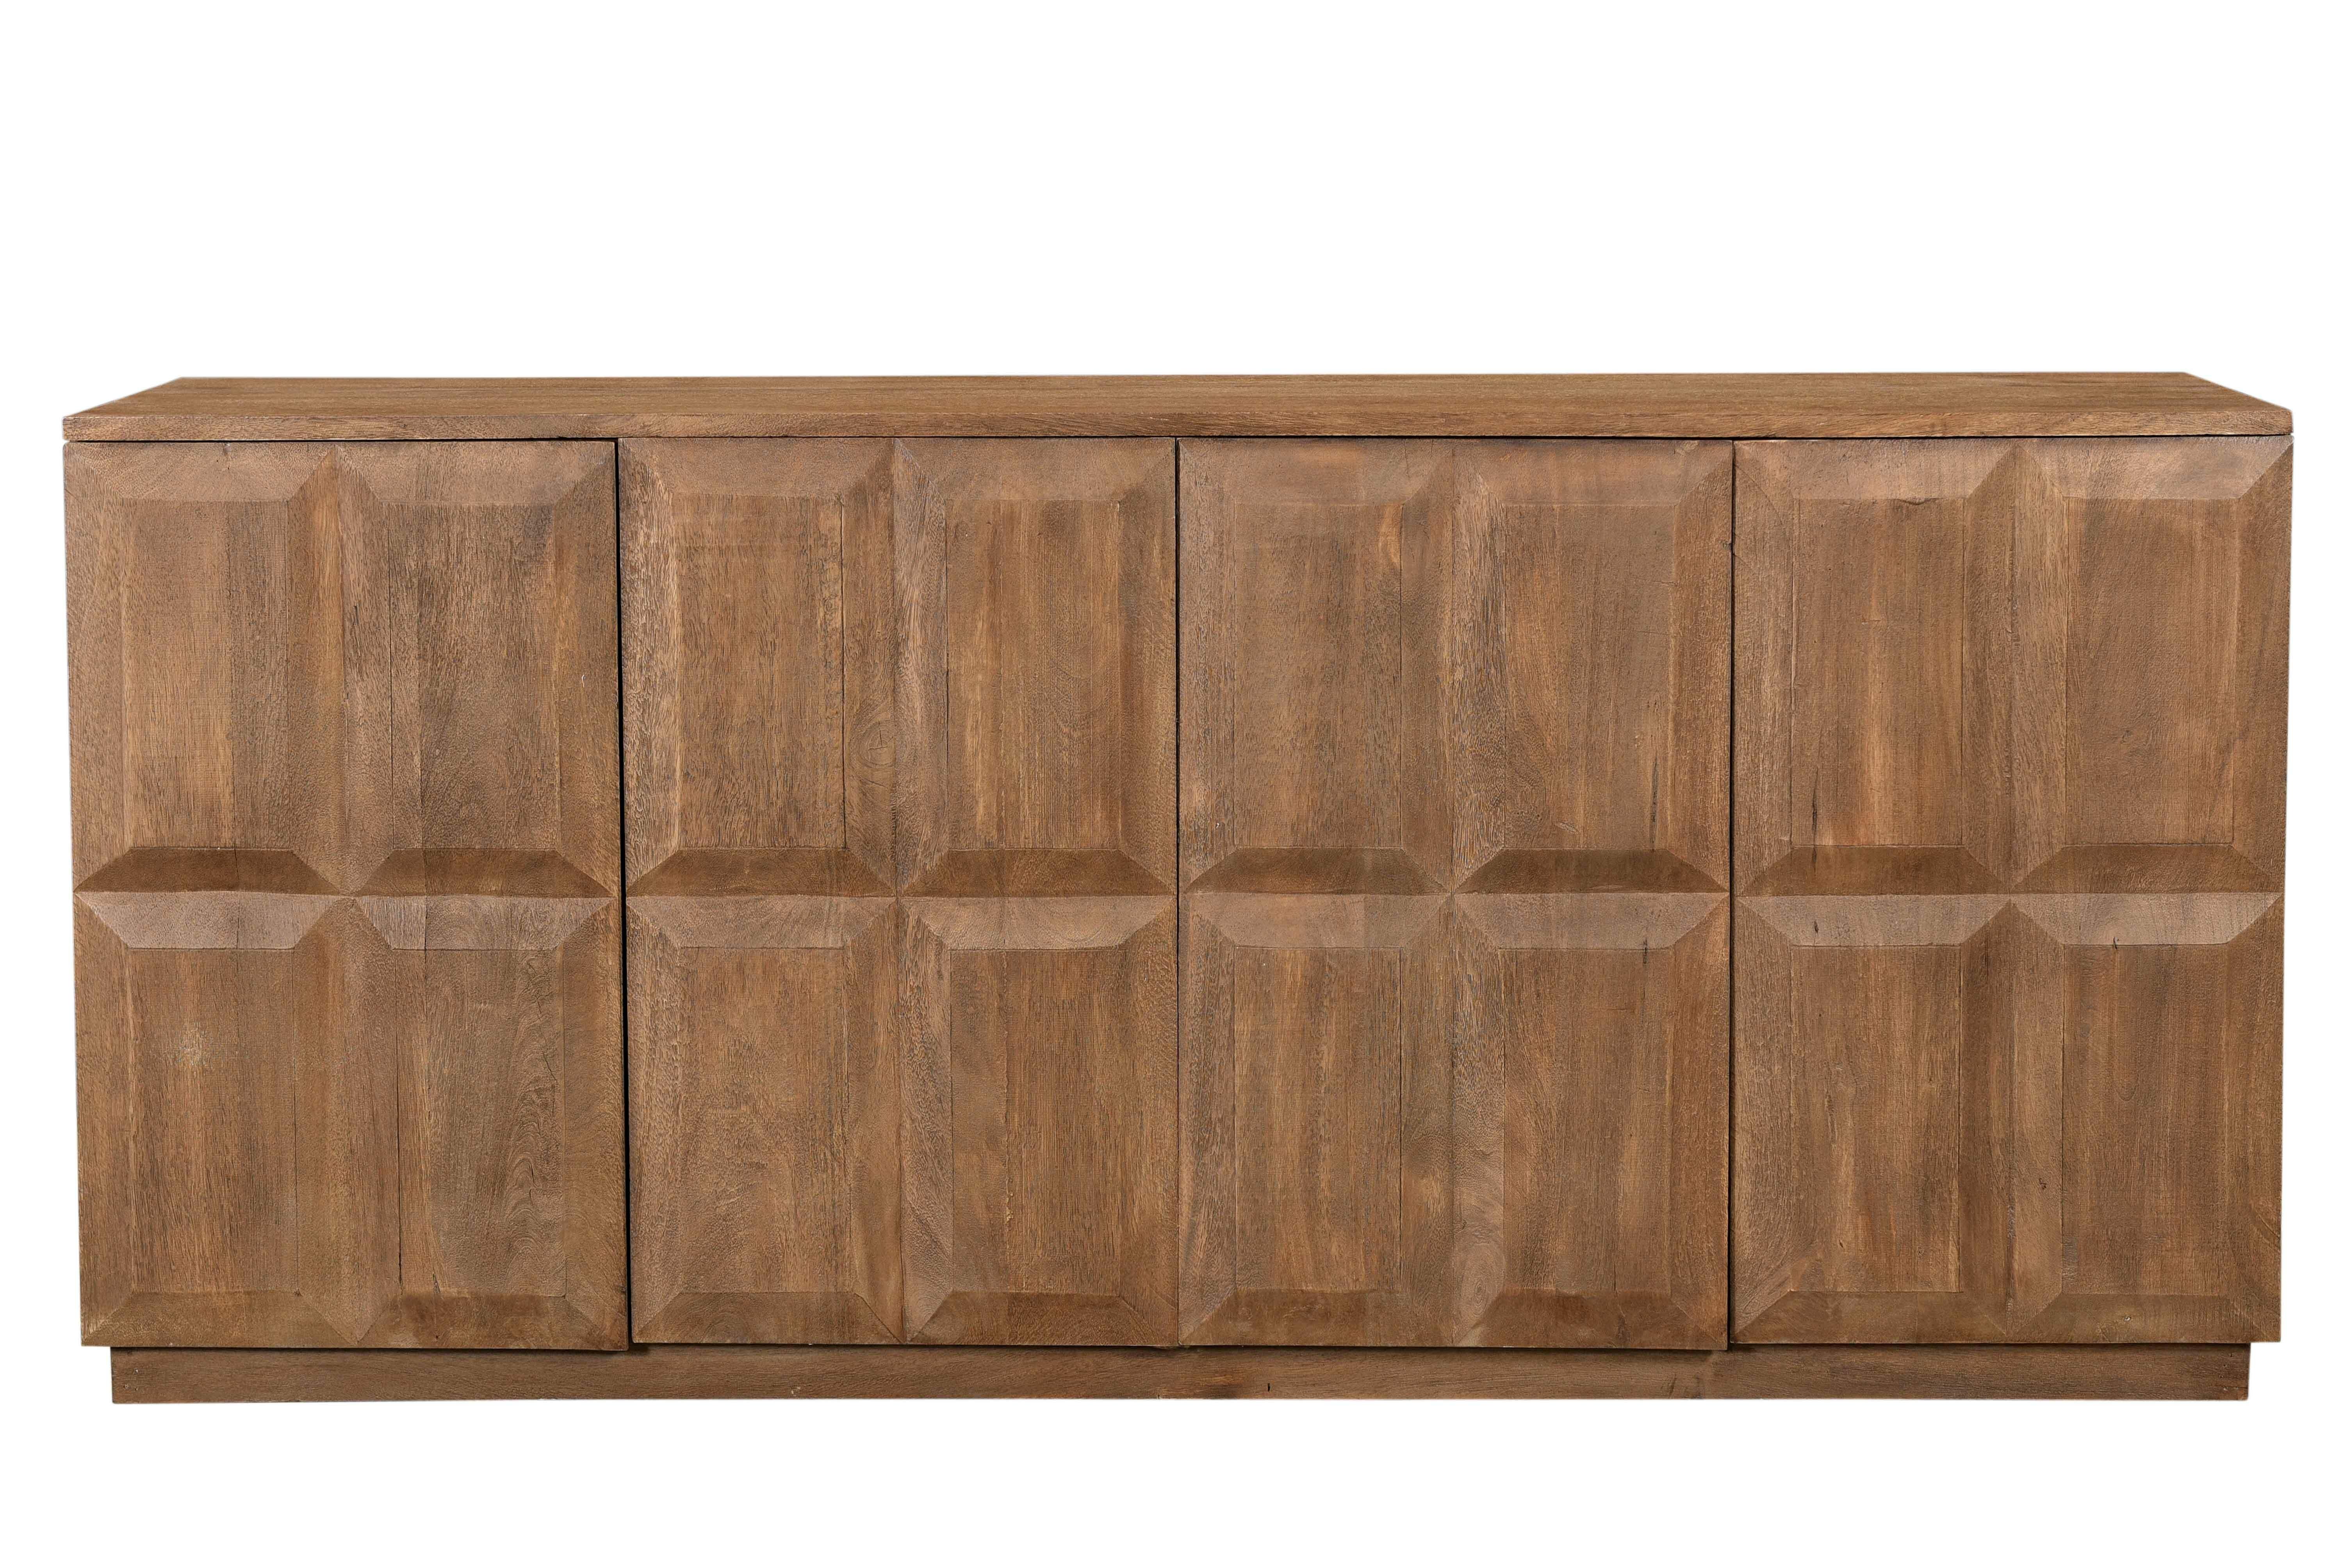 Bracamonte Sideboard throughout Jessenia Sideboards (Image 4 of 30)